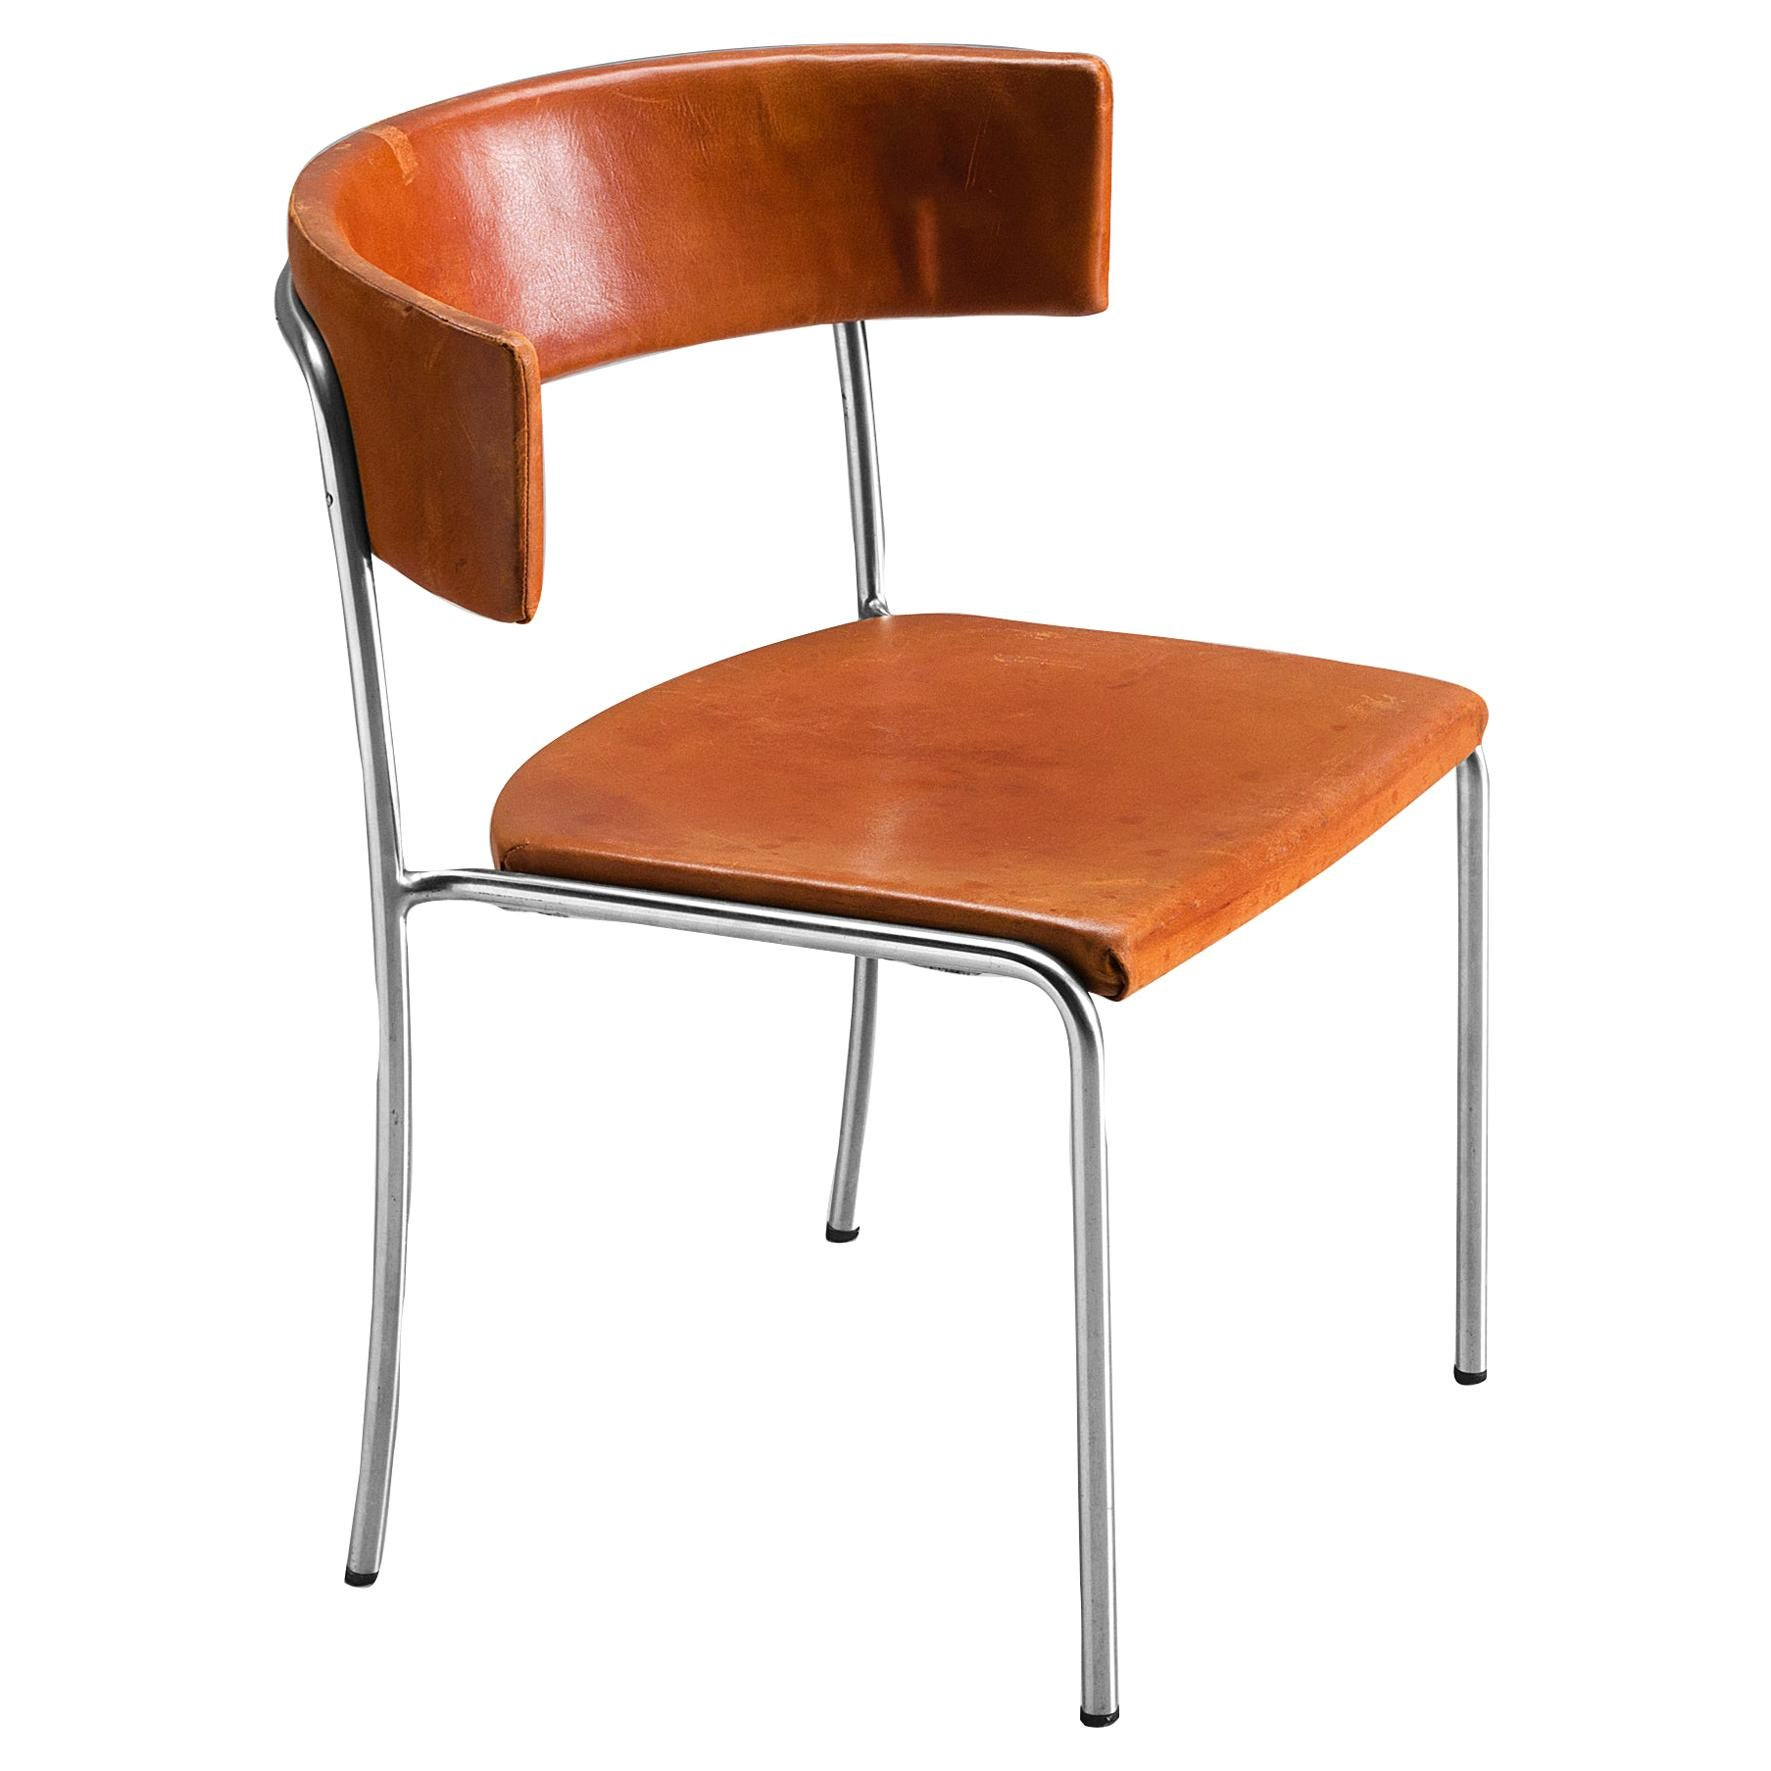 Erik Karlström Side Chair in Cognac Leather and Tubular Steel